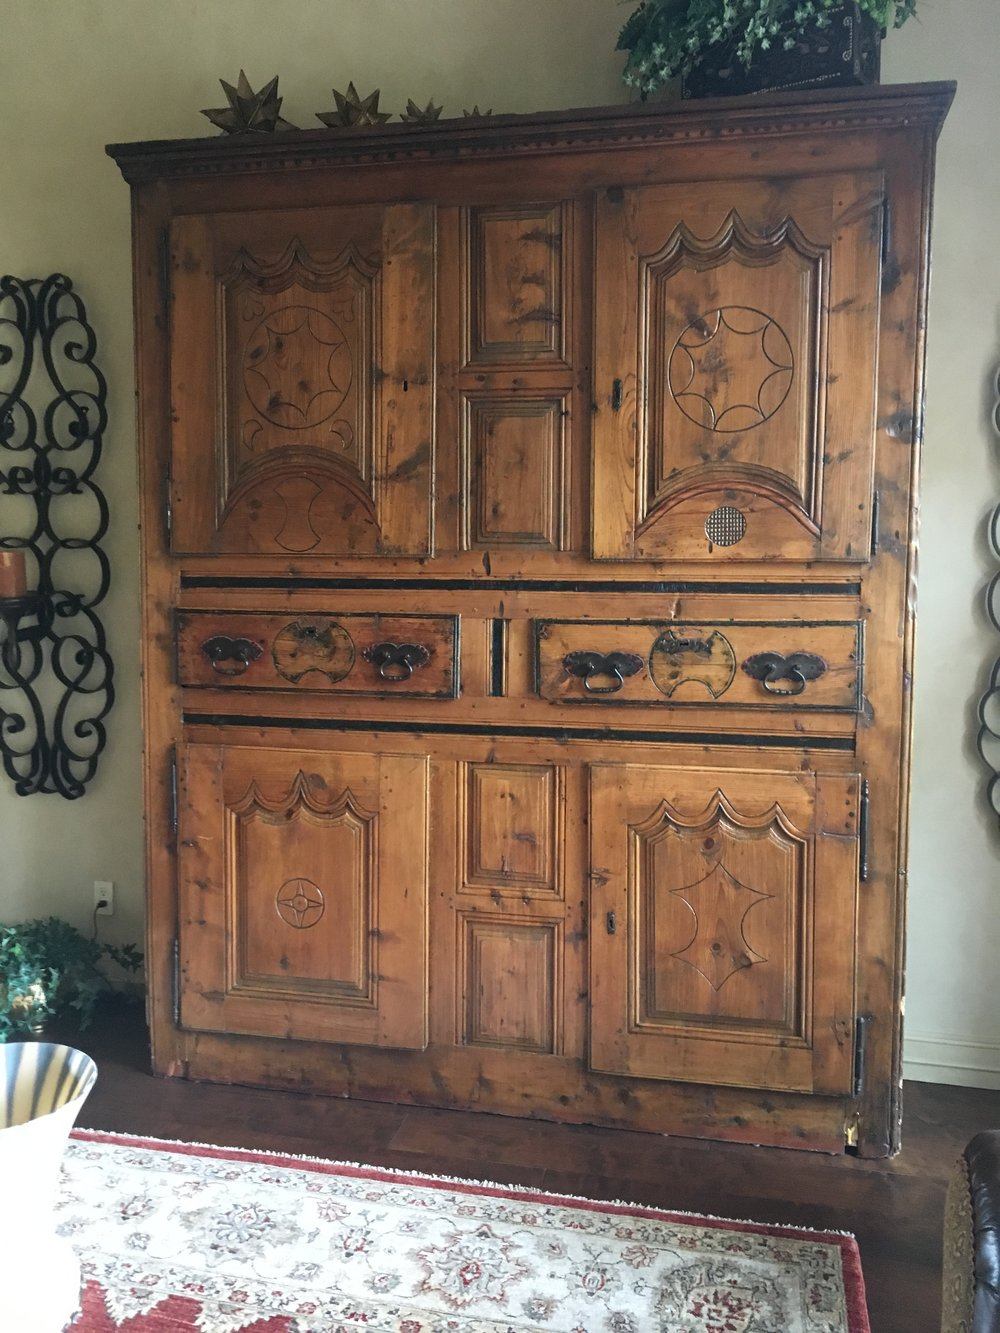 Fiesta Furniture antique spanish armoire. 18th cent armoire.JPG - Fiesta Furniture Antique Spanish Armoire — High Line Furniture